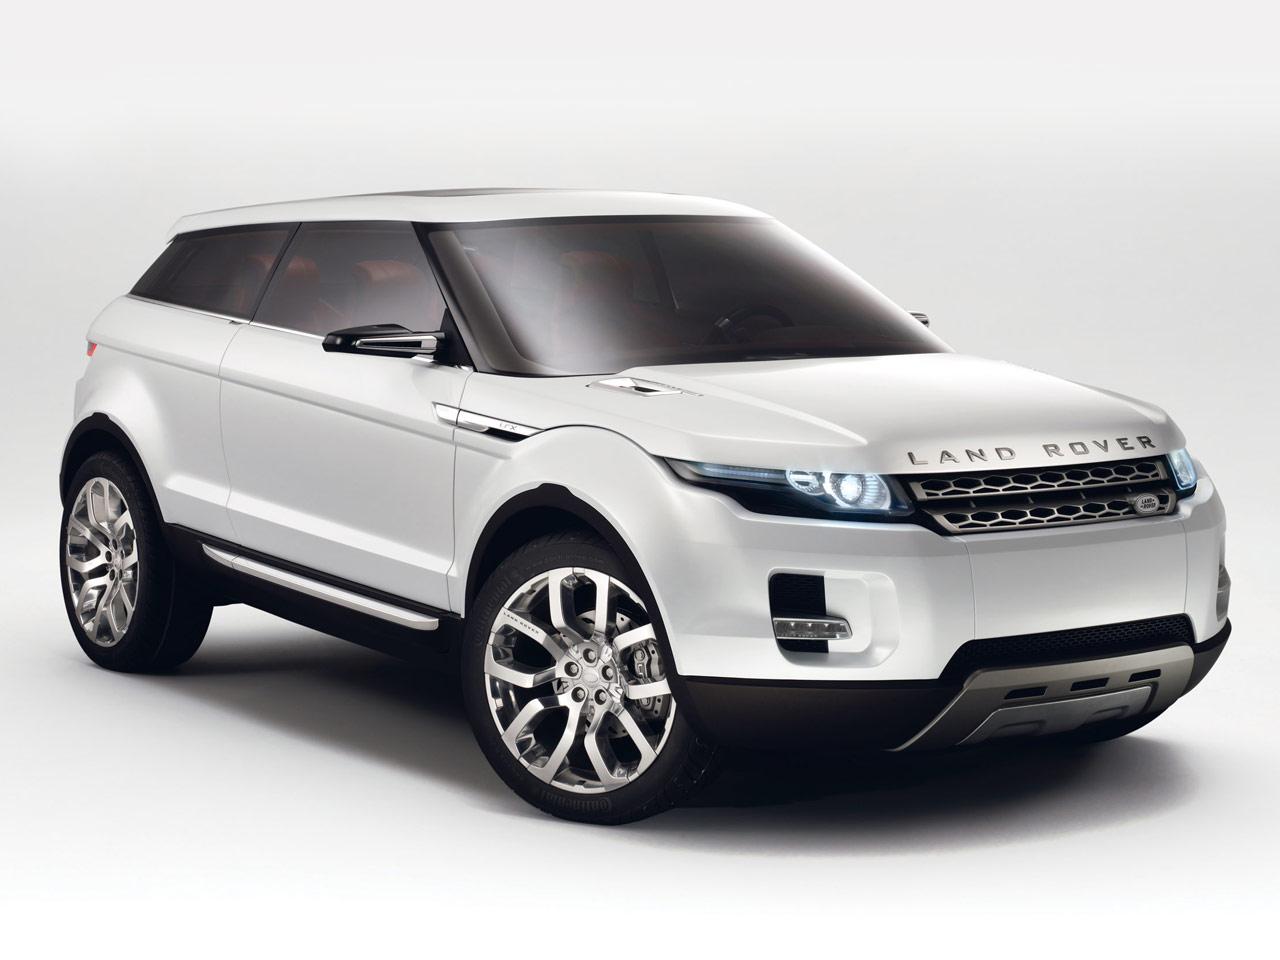 http://4.bp.blogspot.com/-CuR2Kcf2Vcs/TnrpC99e9xI/AAAAAAAAGHk/PmwNAR2EHPU/s1600/land-rover-luxury-car.jpg